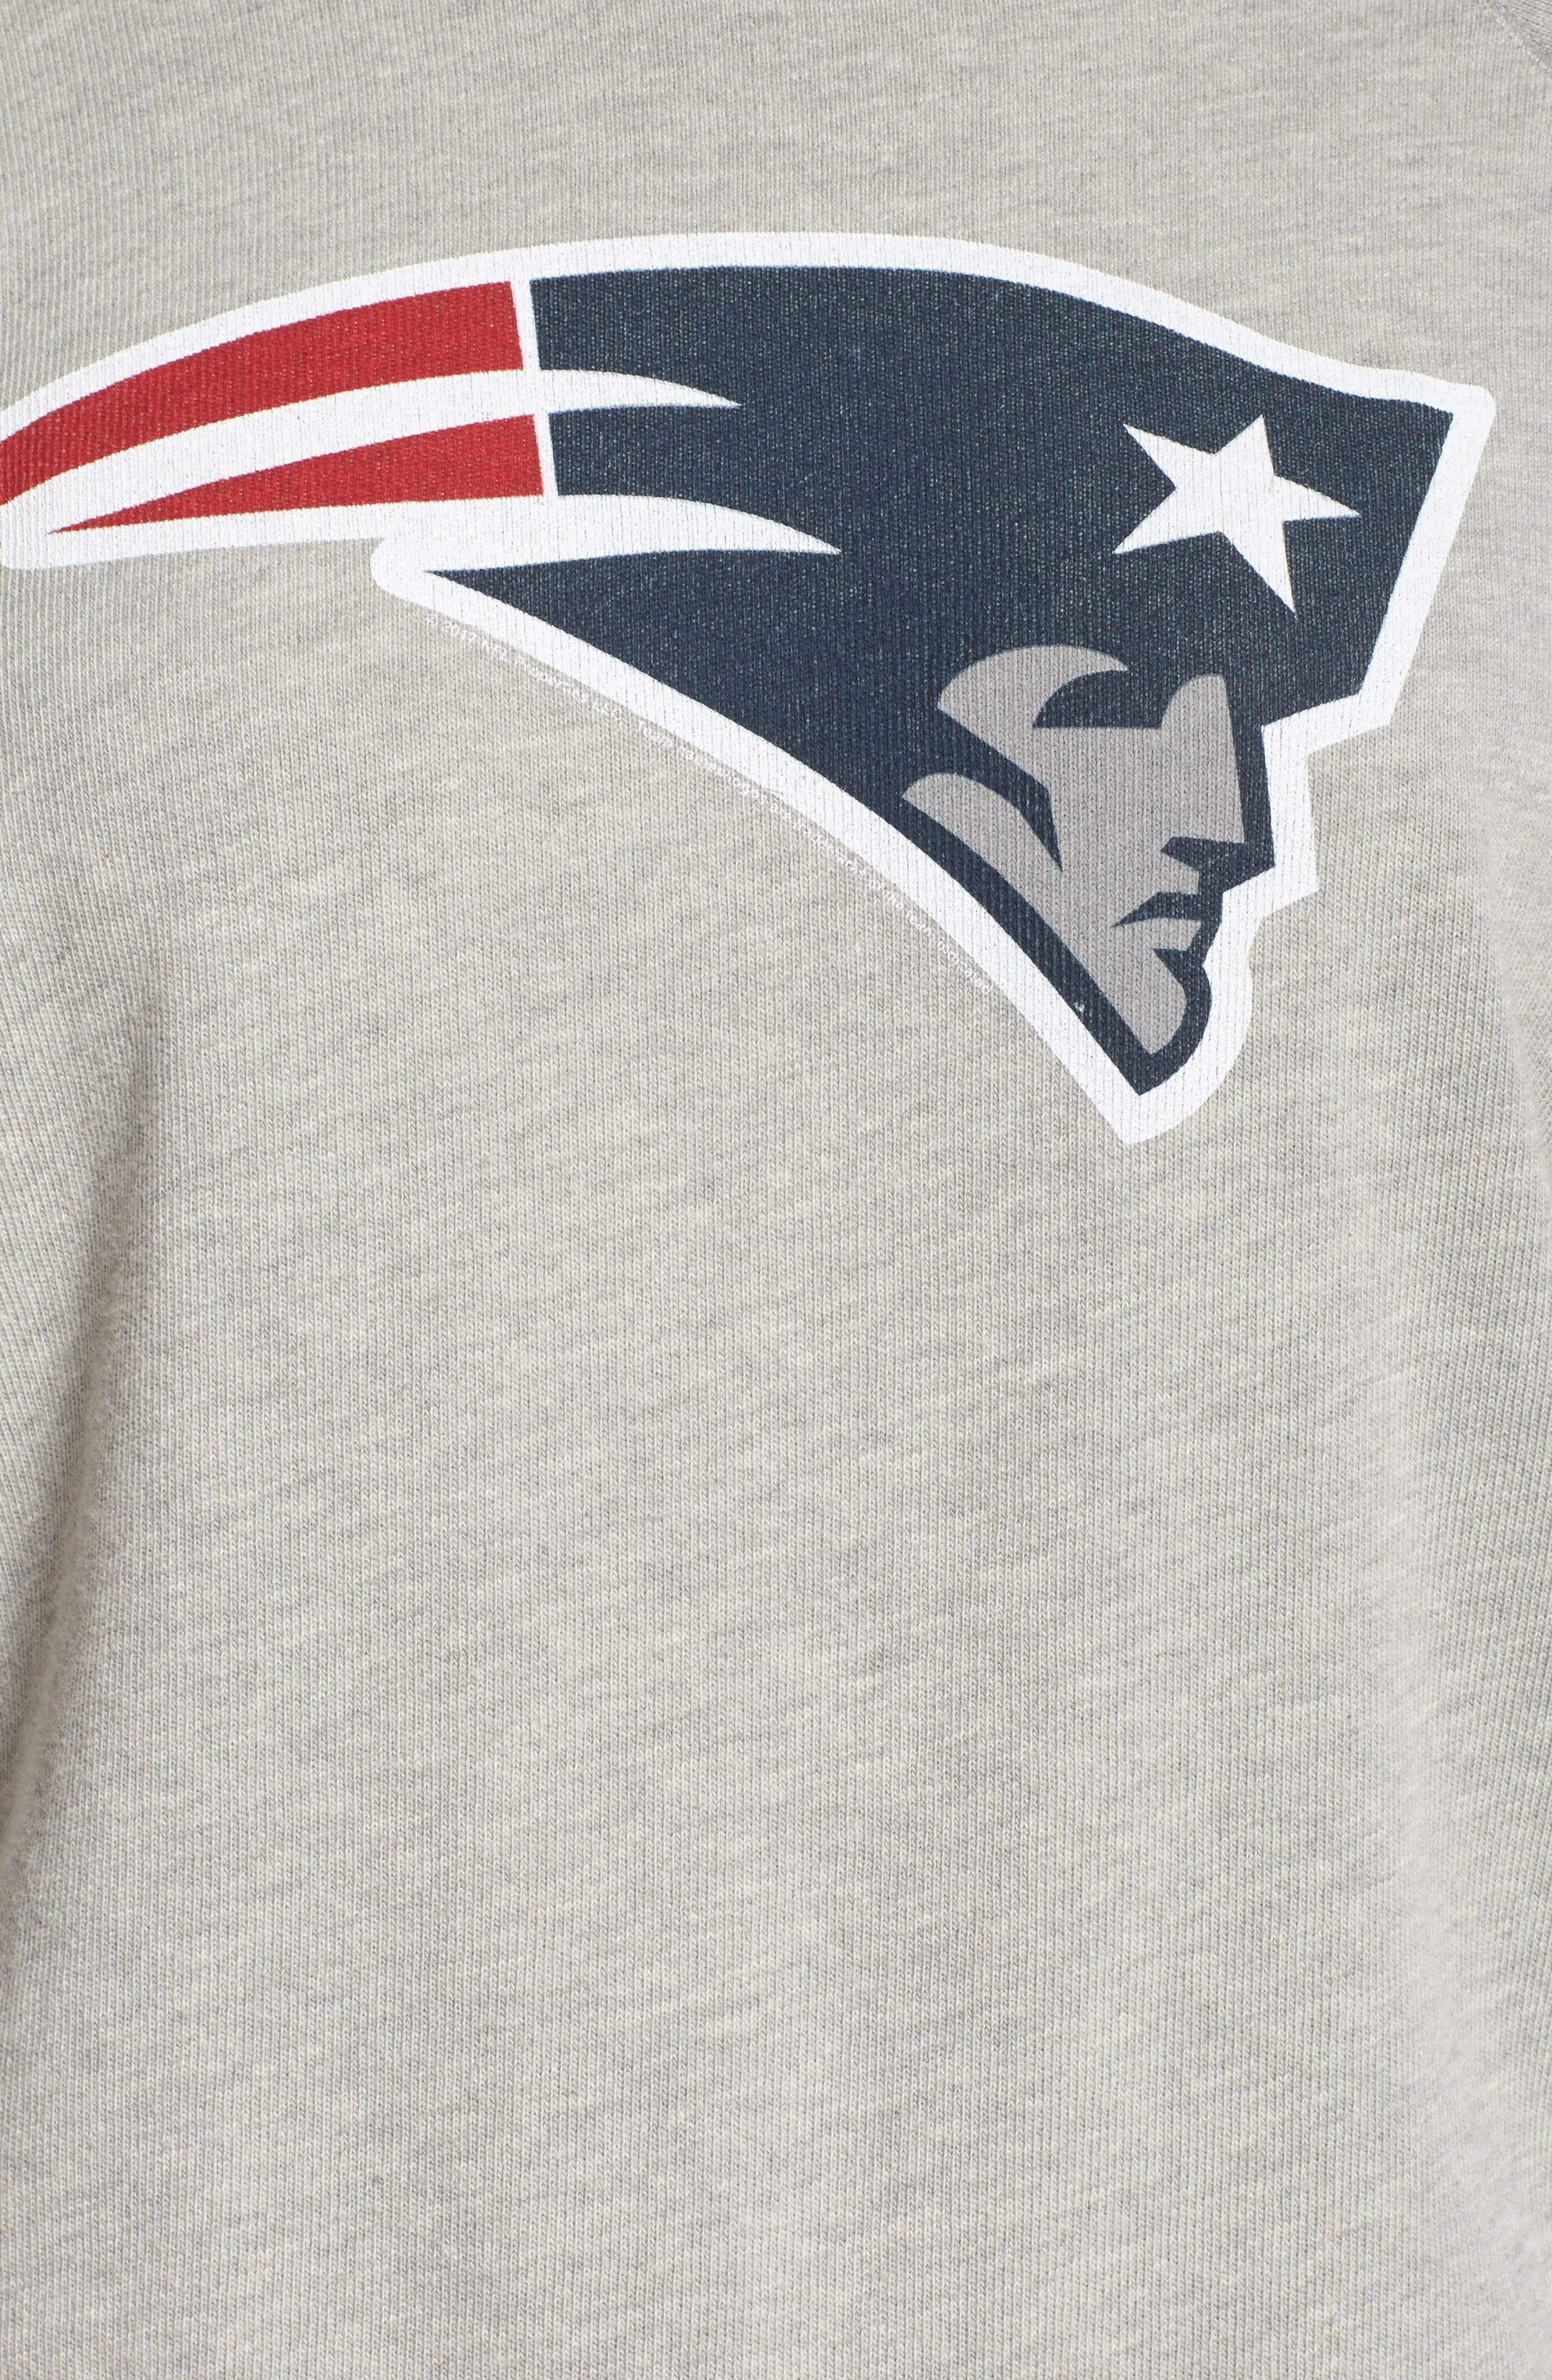 NFL New England Patriots Hacci Sweatshirt,                             Alternate thumbnail 5, color,                             030